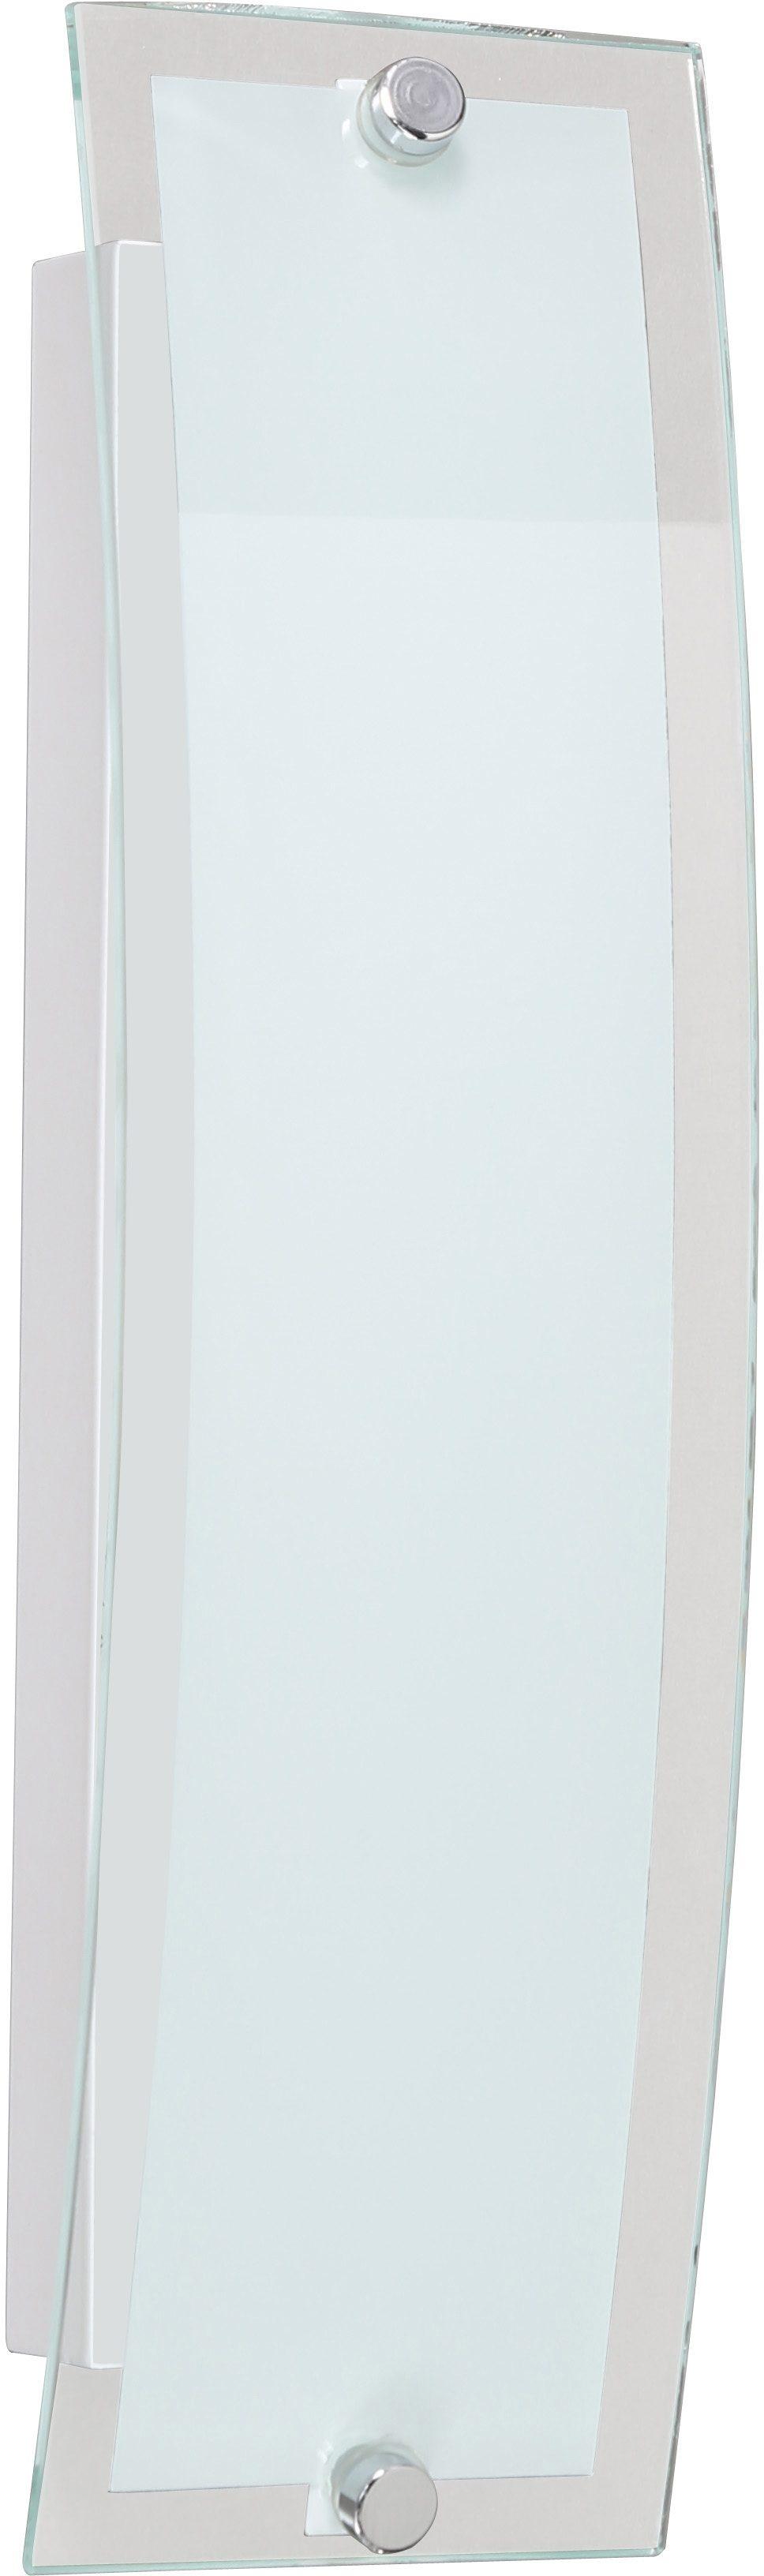 WOFI LED Wandleuchte LORENZ, LED-Board